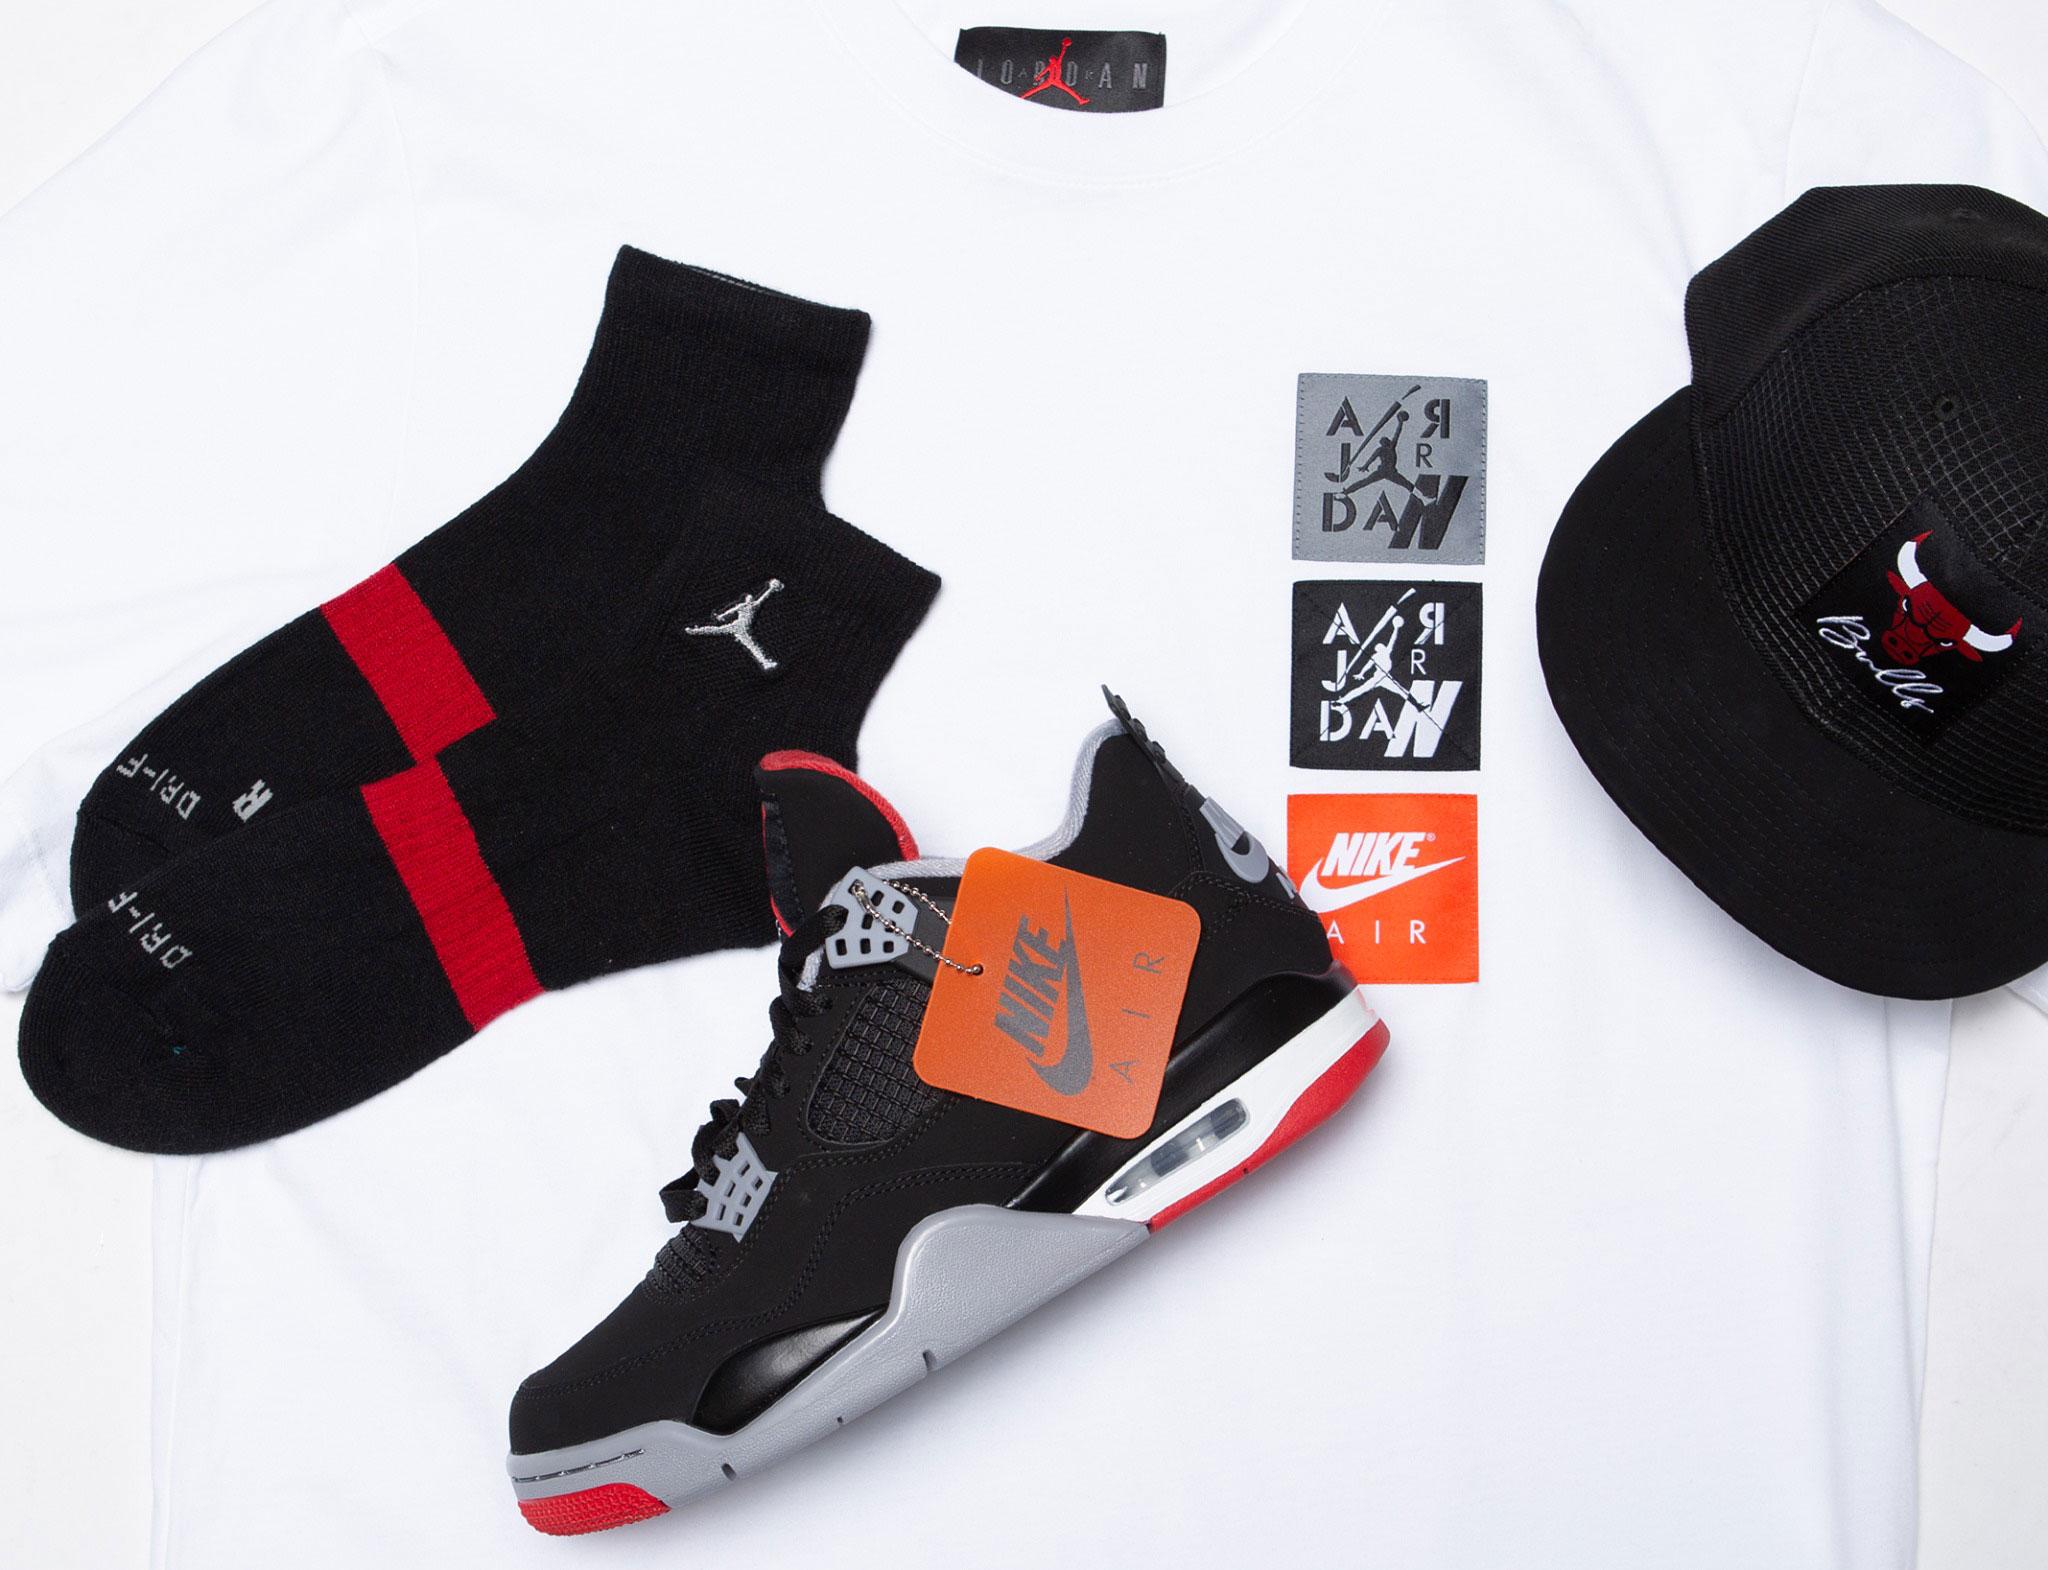 jordan-4-bred-hat-shirt-socks-outfit-match